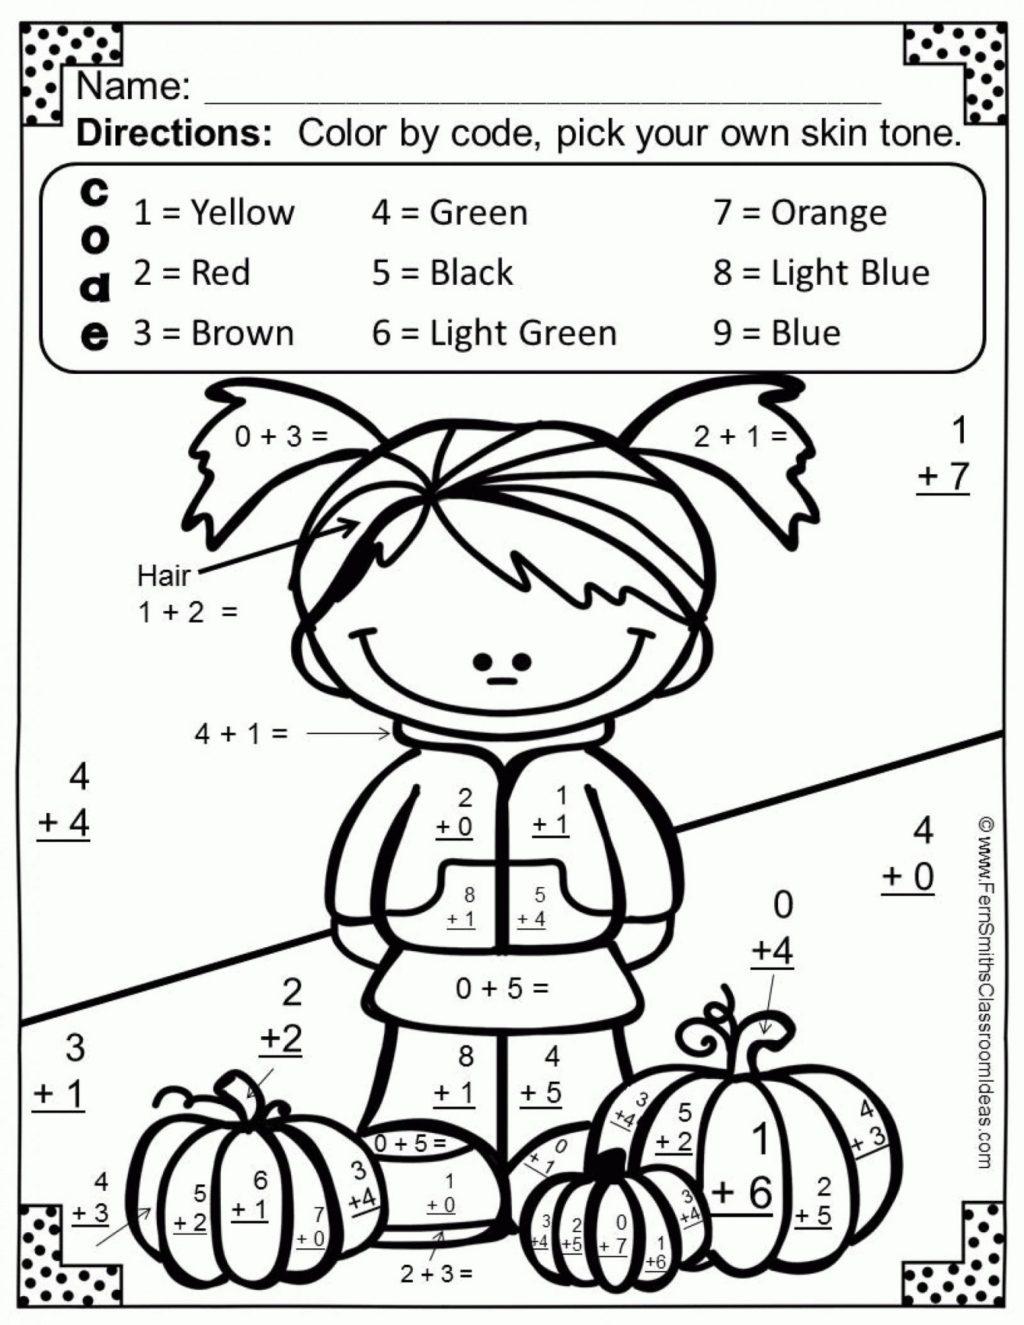 Worksheet ~ Marvelous Coloring Math Worksheets Photo Ideas